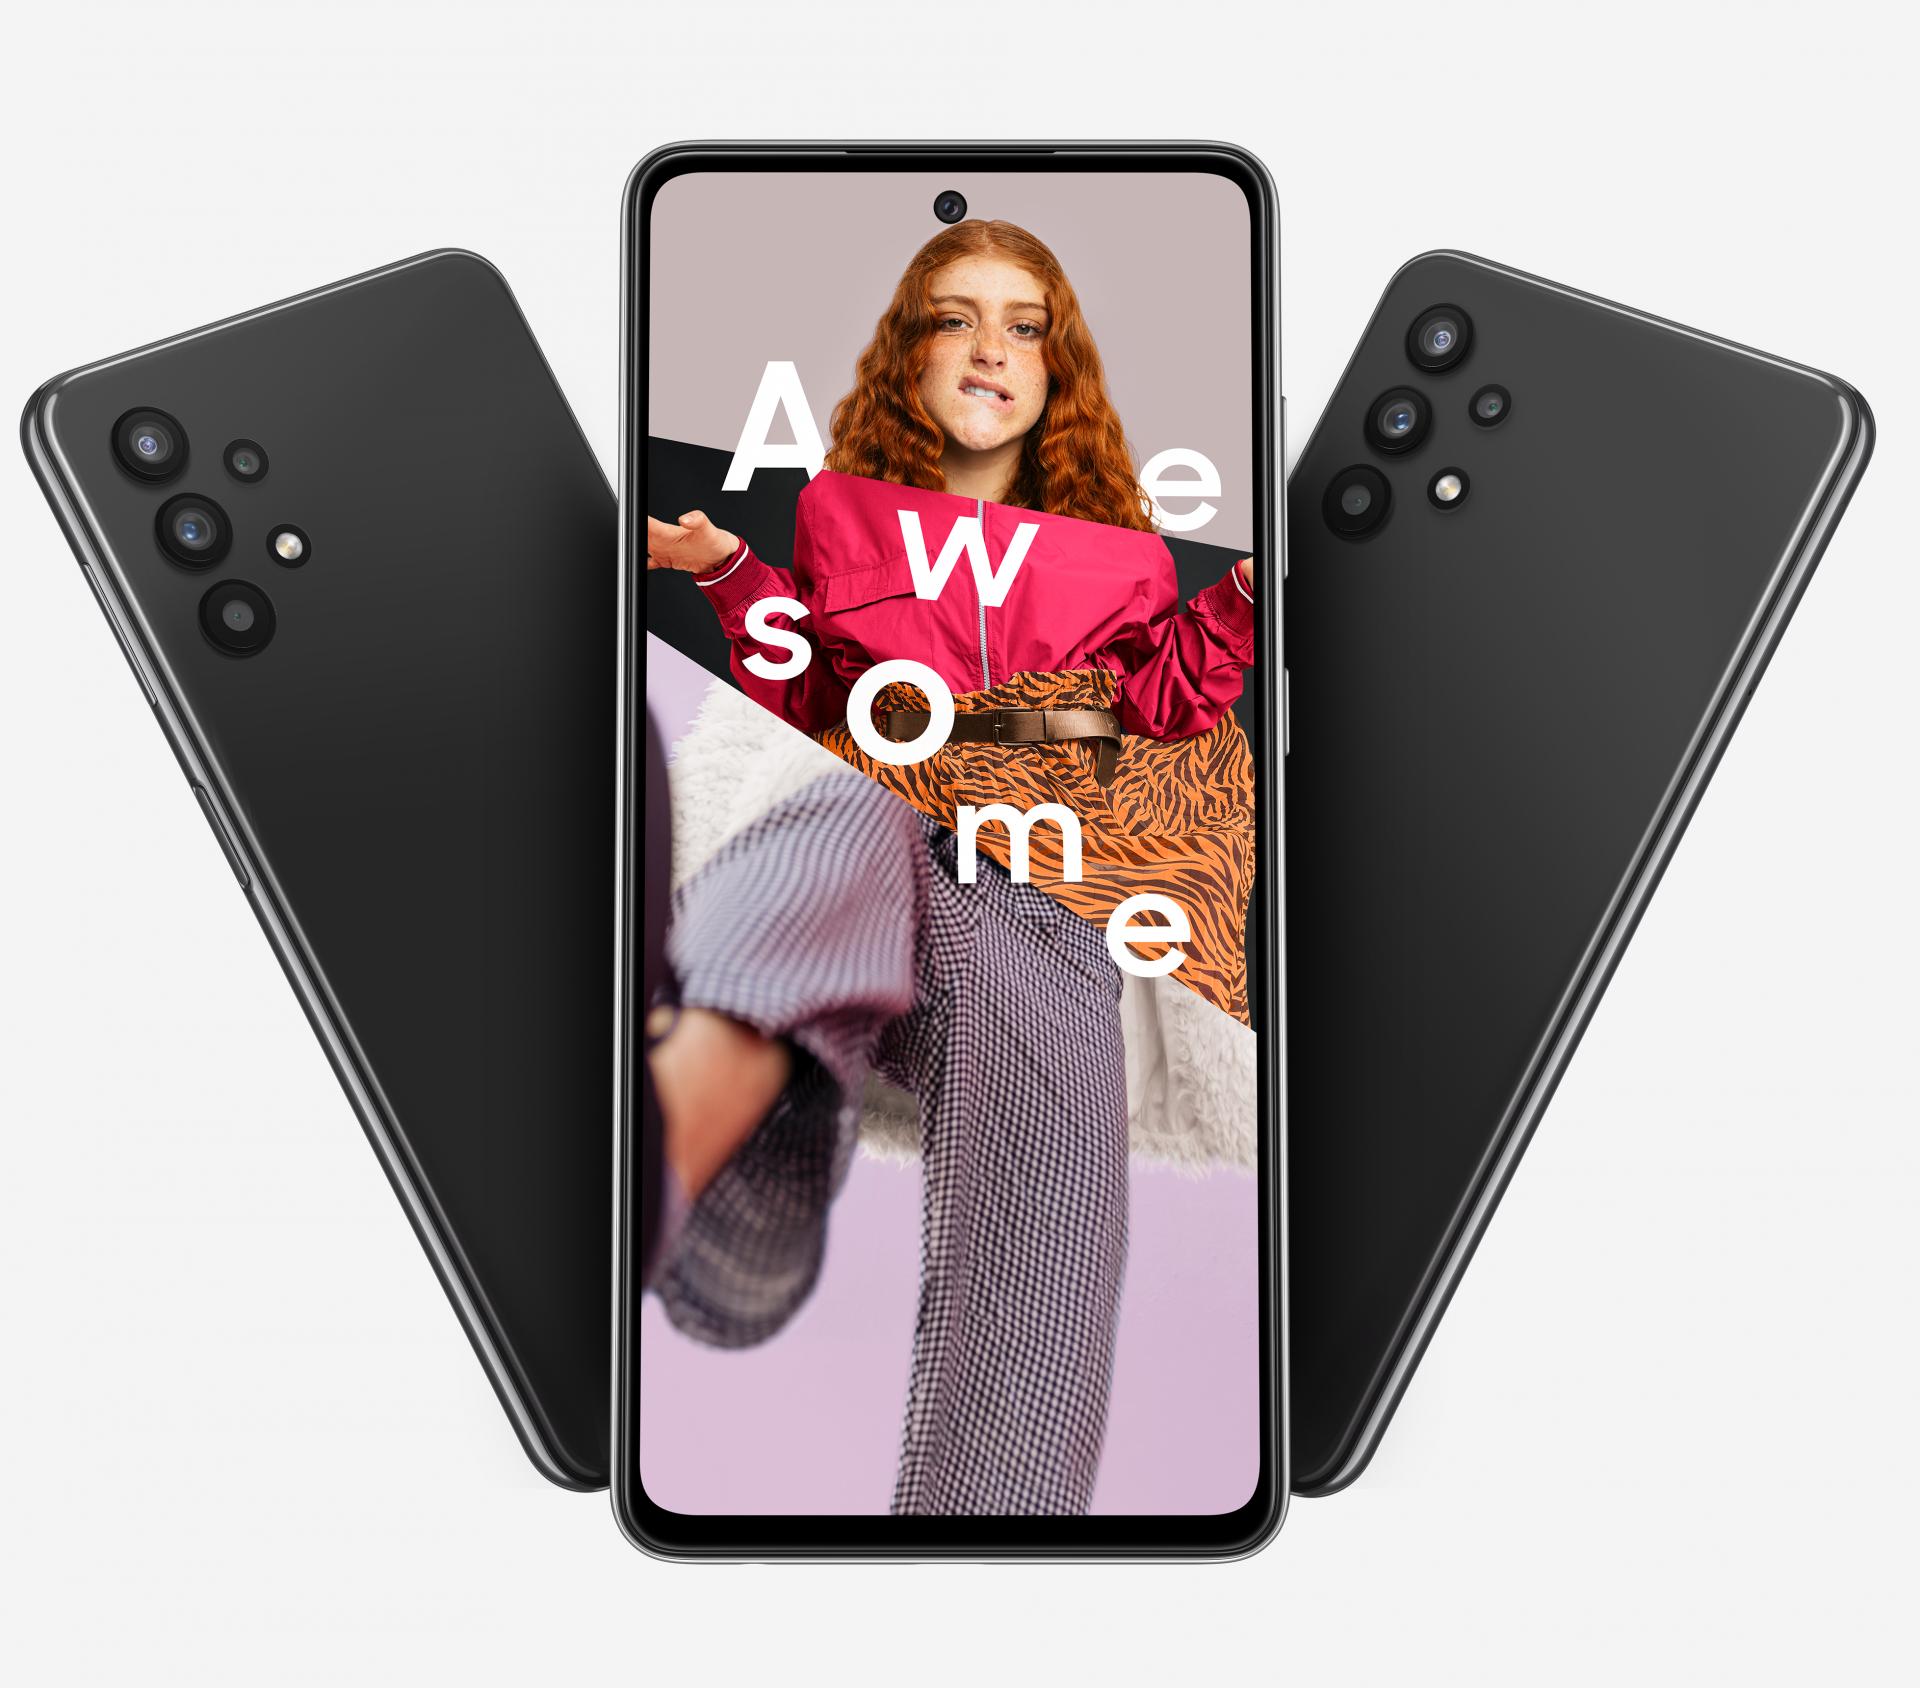 Samsung Galaxy A52 5G and A32 5G smartphones